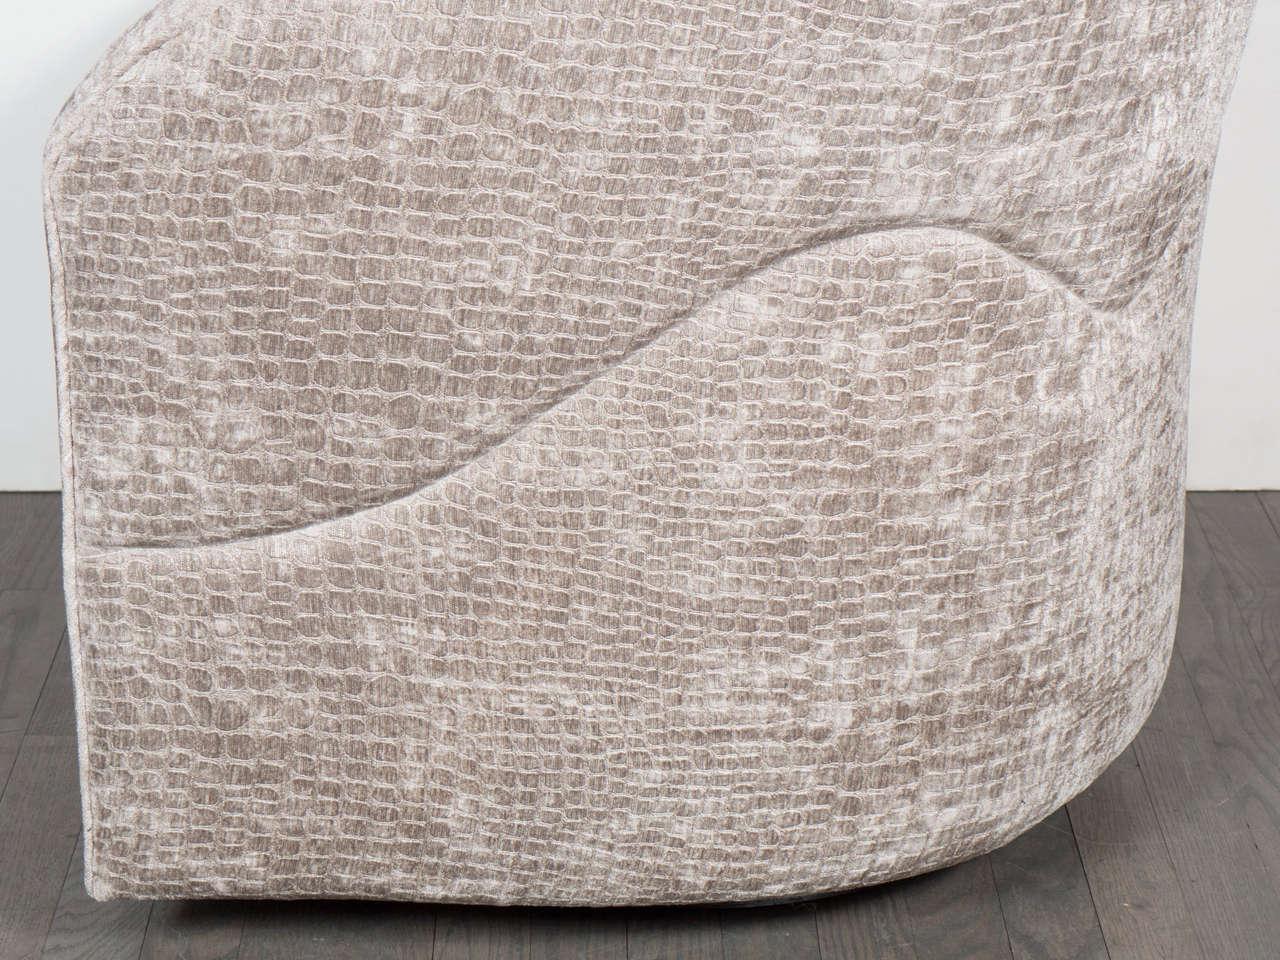 Mid-Century Modernist Swivel Chair by Milo Baughman in Crocodile Velvet For Sale 2